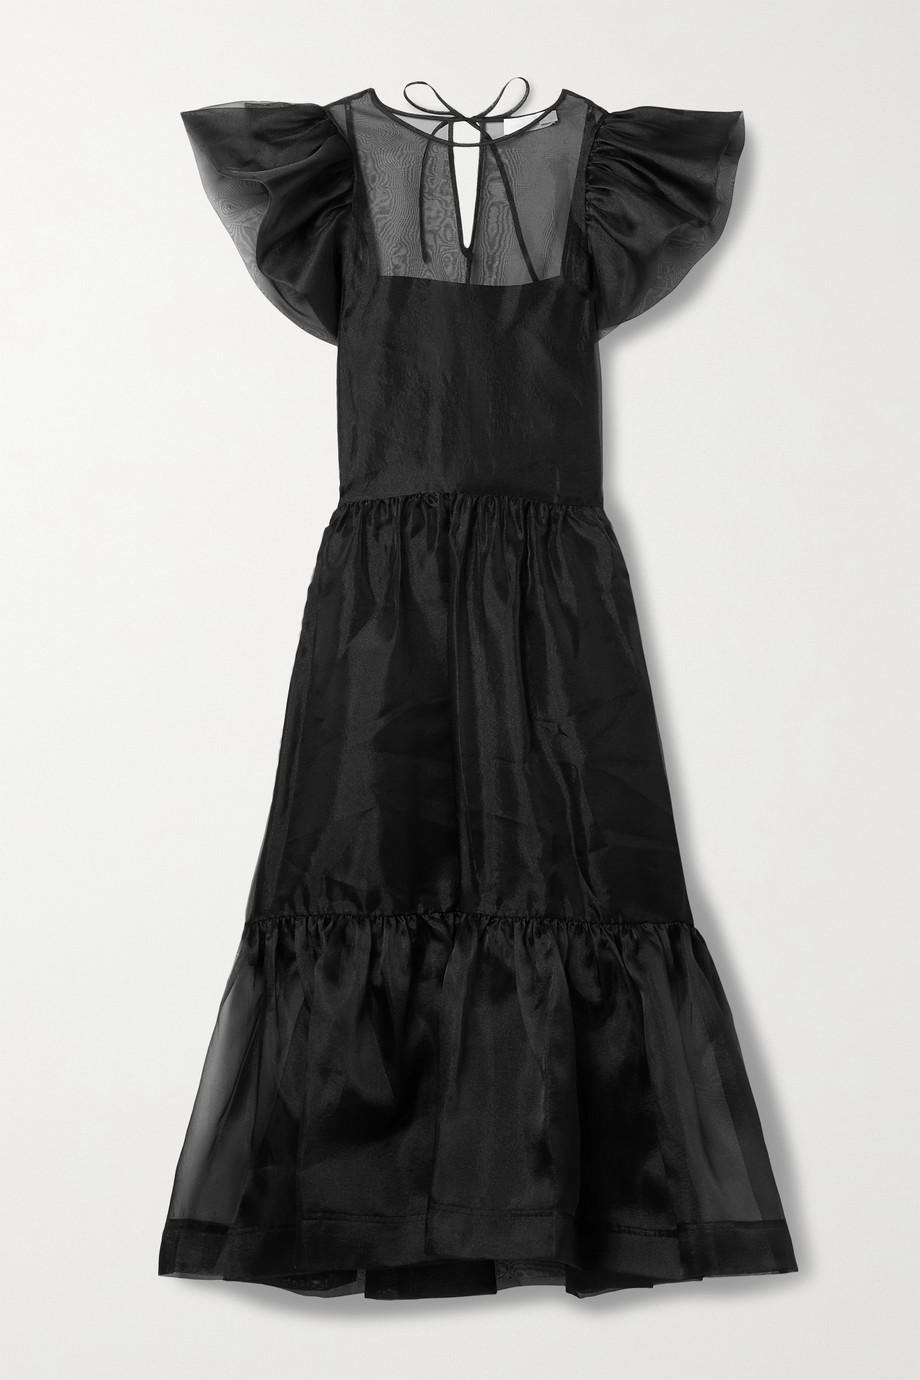 Jonathan Simkhai Ines ruffled tiered recycled organza midi dress